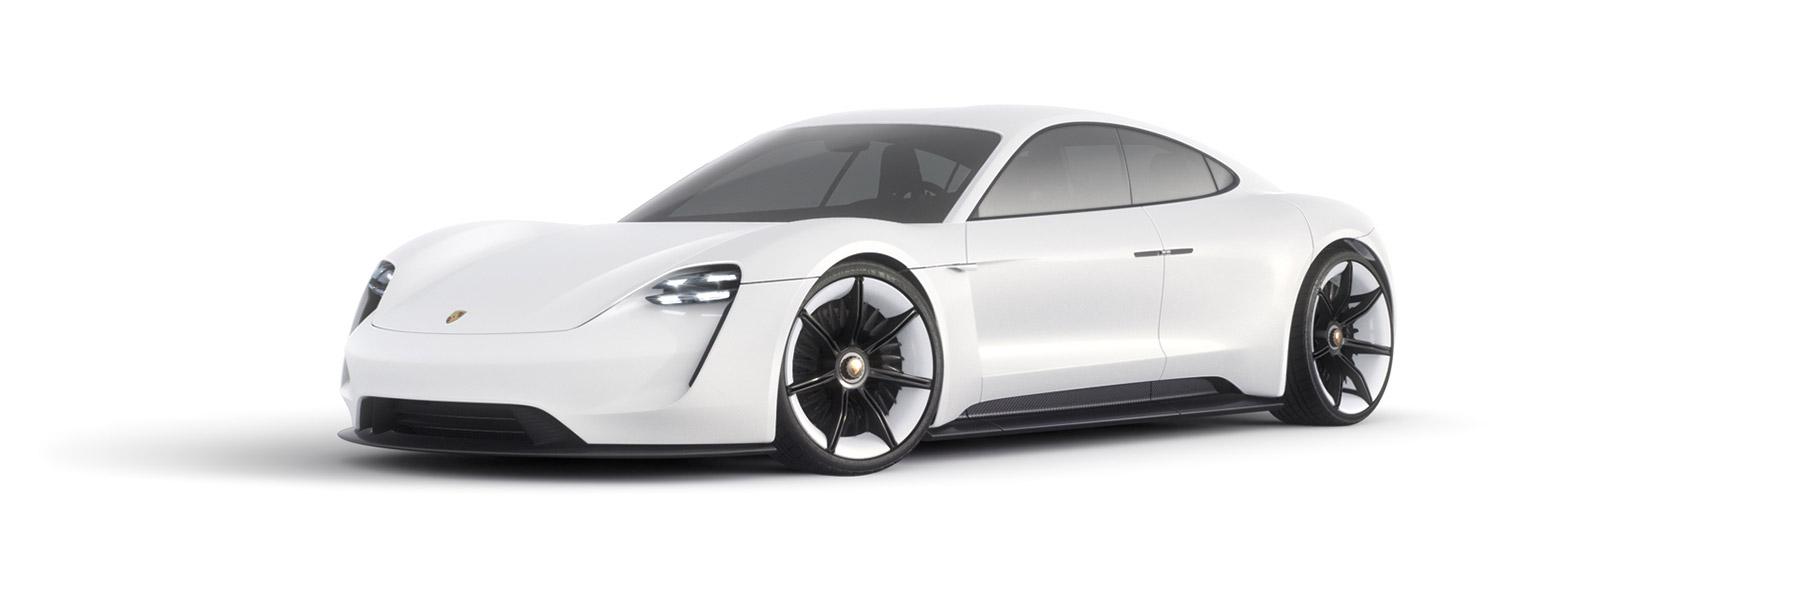 Porsche Alquiler venta renting coches de lujo en Barcelona